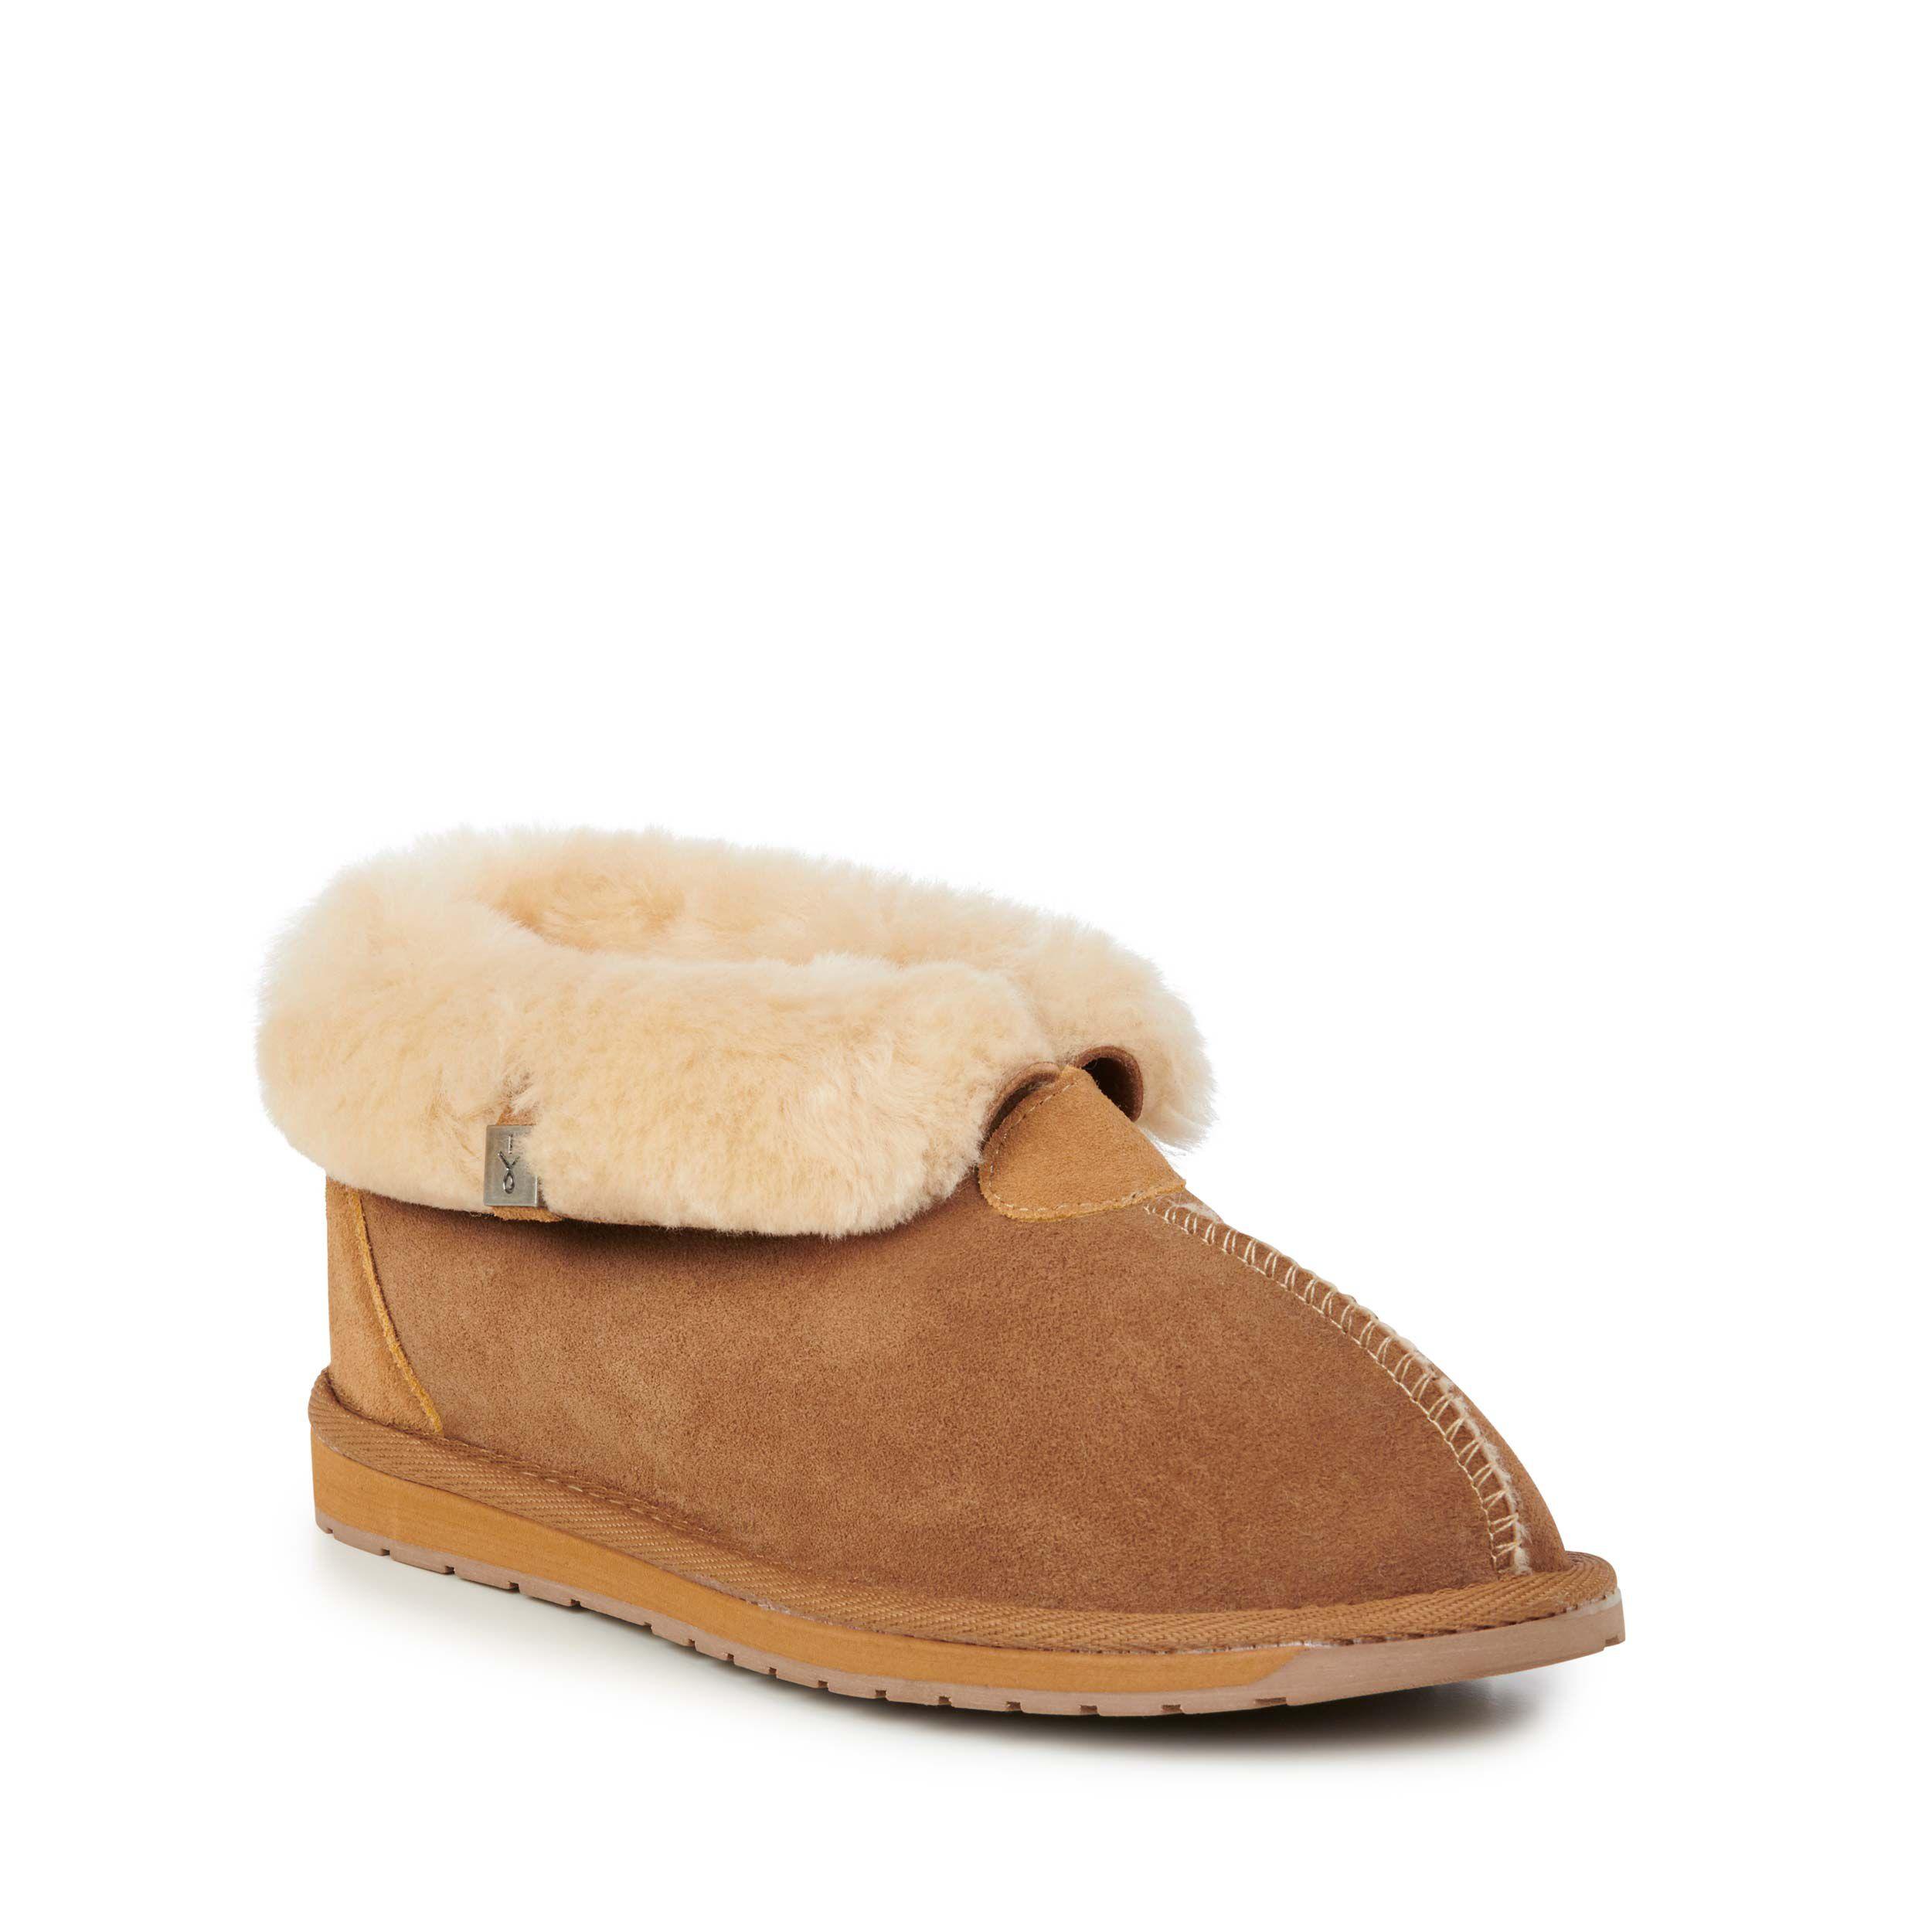 Albany 羊毛翻口便鞋